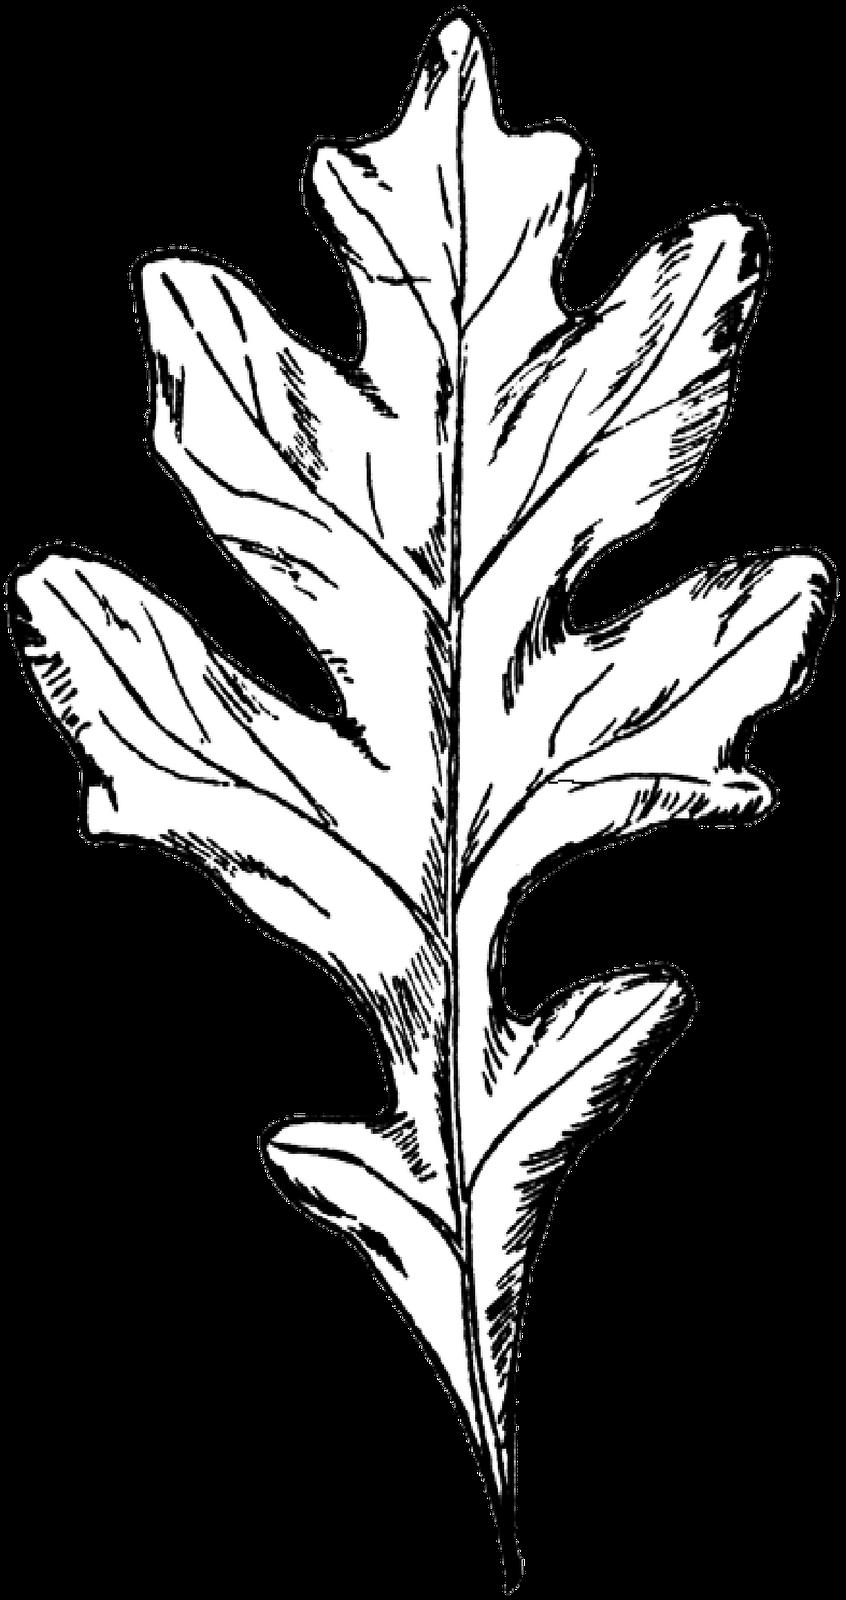 svg free download foliage drawing digital painting #112929536